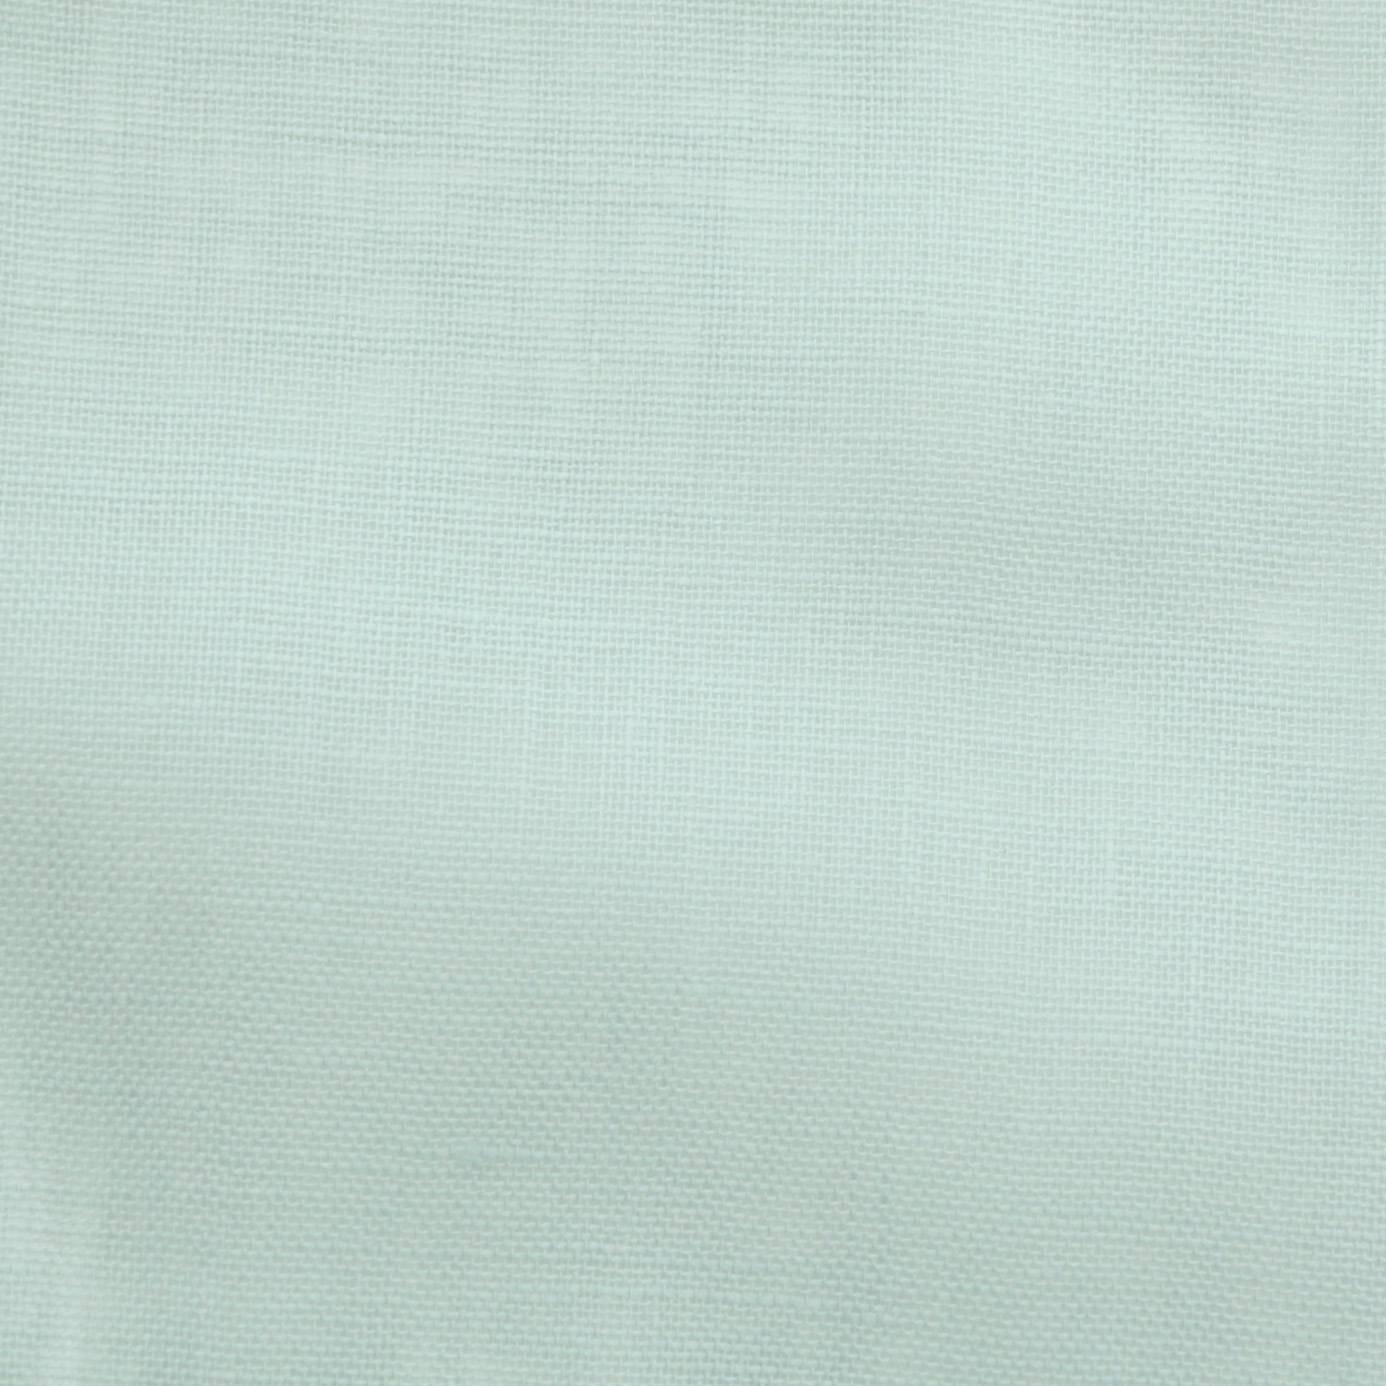 Lightweight Sheers Fabric Mosaic 243350 Sanderson Lightweight Sheers Fabric Collection